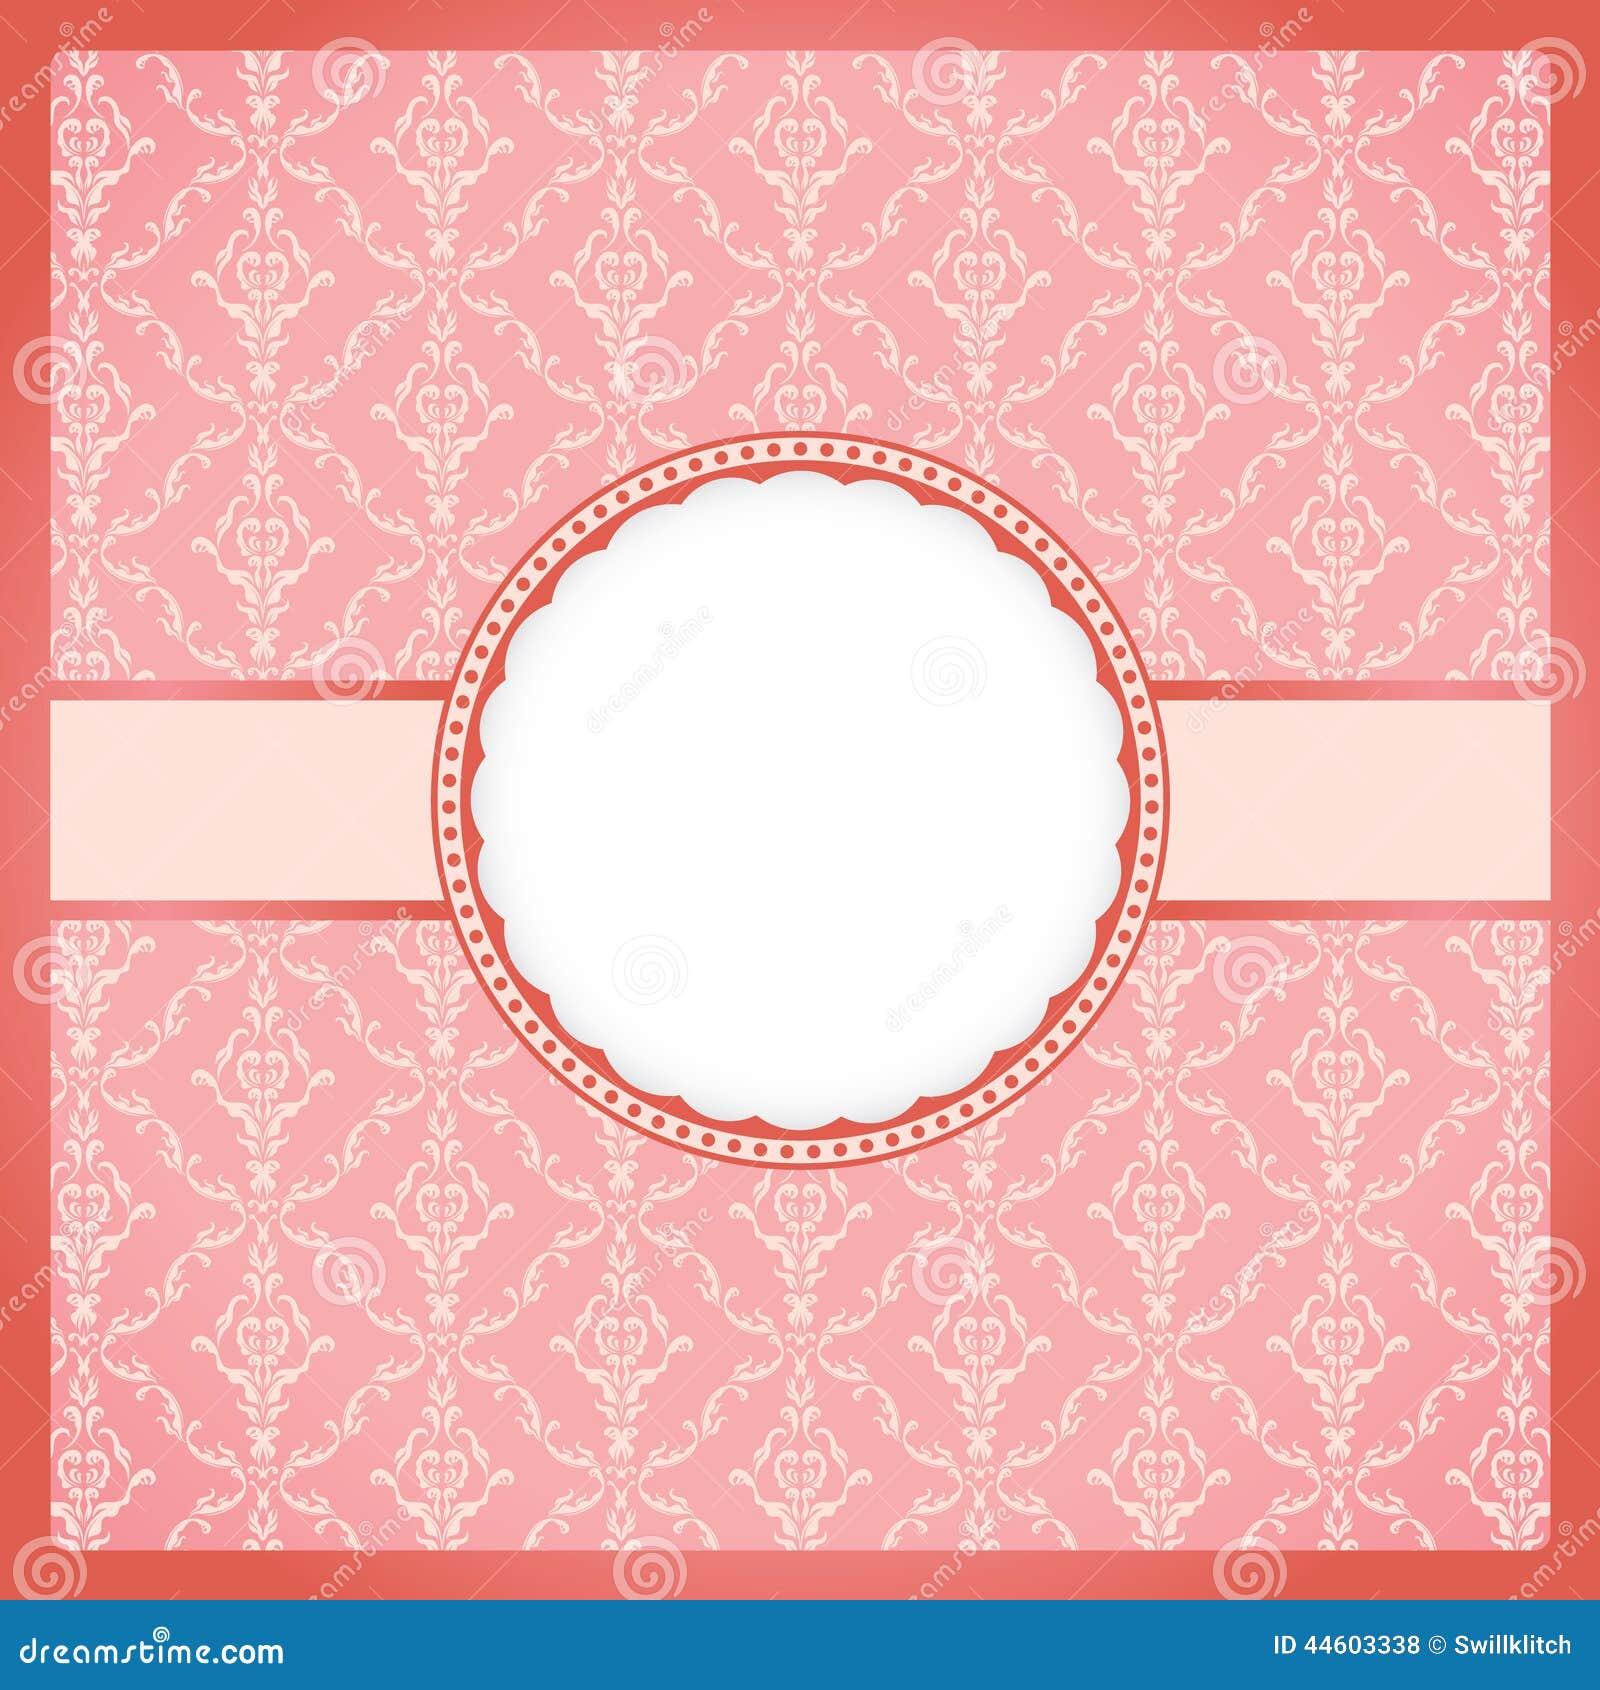 Wedding Invitation Package was adorable invitations design